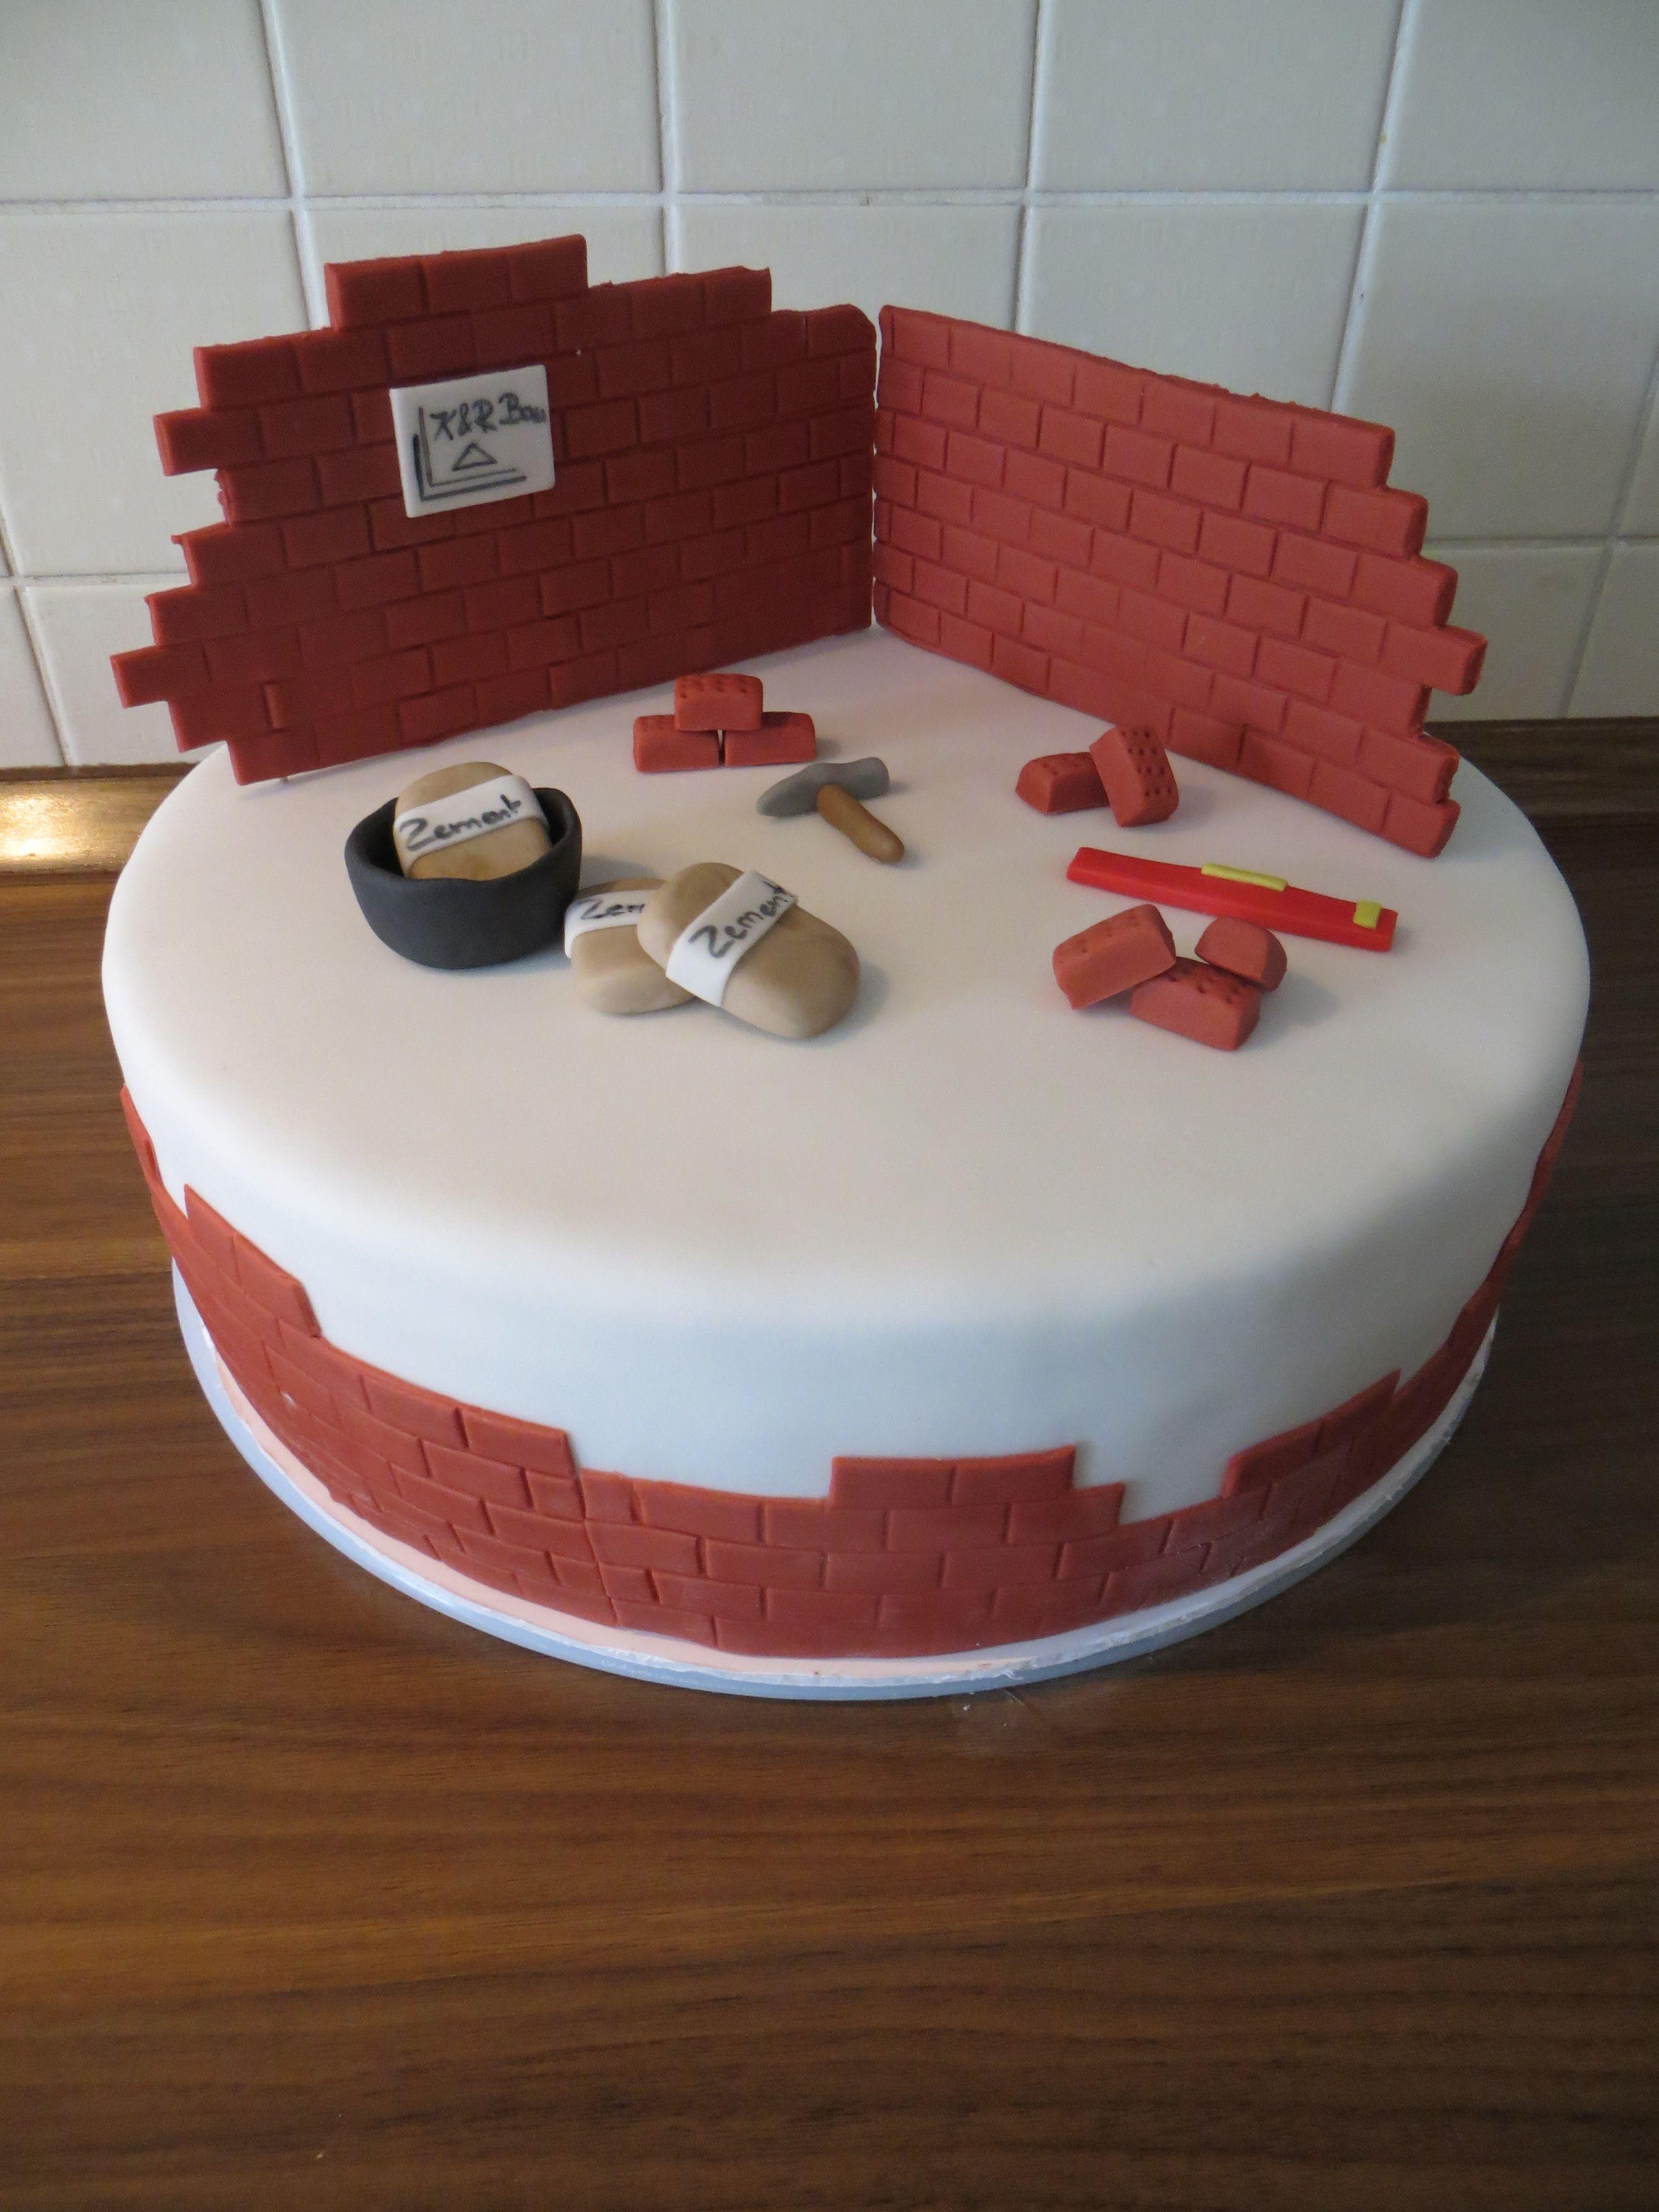 maurer torte fondant deko kuchen kuchen rezepte und fondant torten. Black Bedroom Furniture Sets. Home Design Ideas